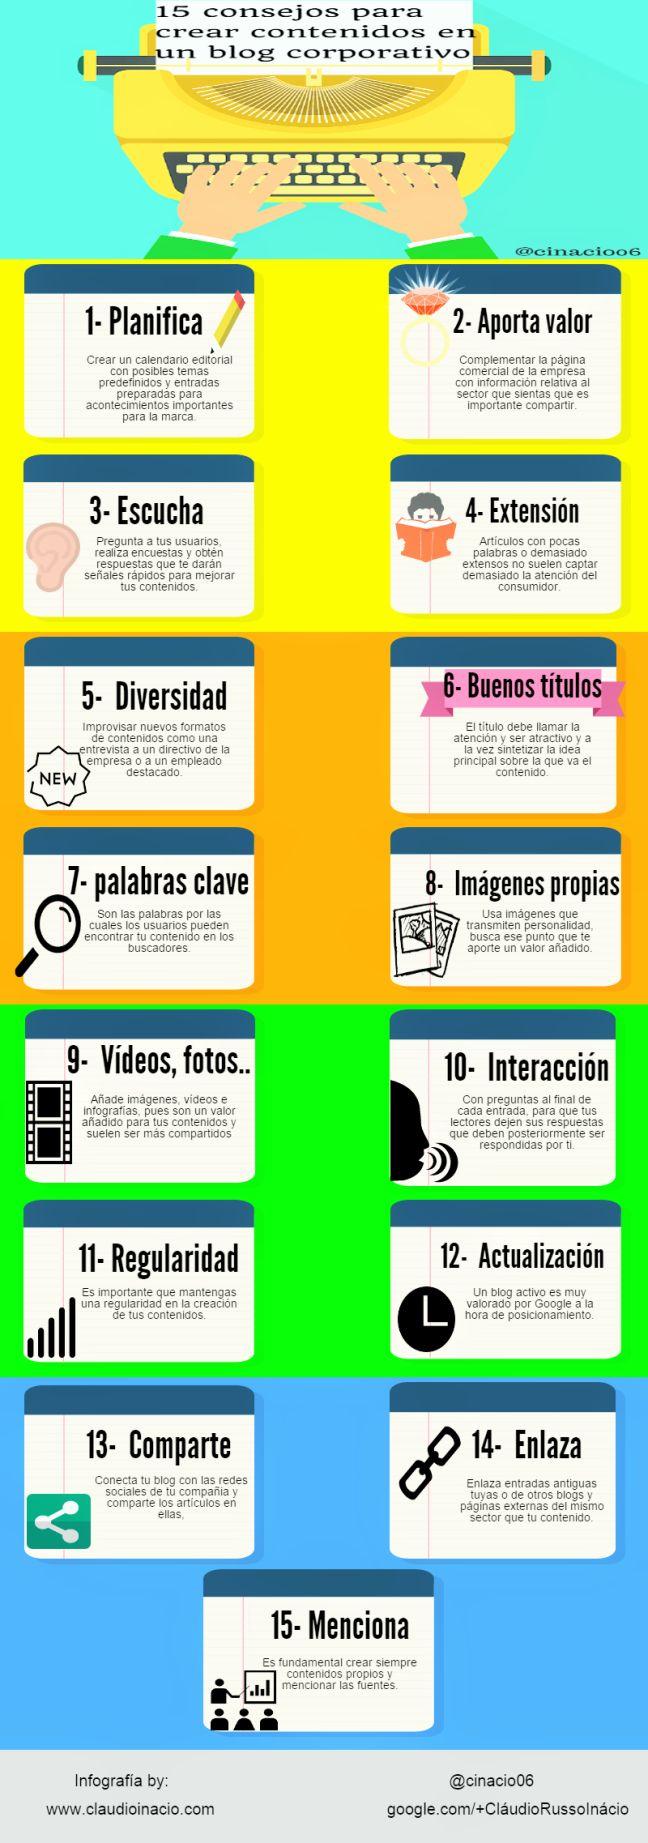 15 consejos para crear contenidos en un blog corporativo